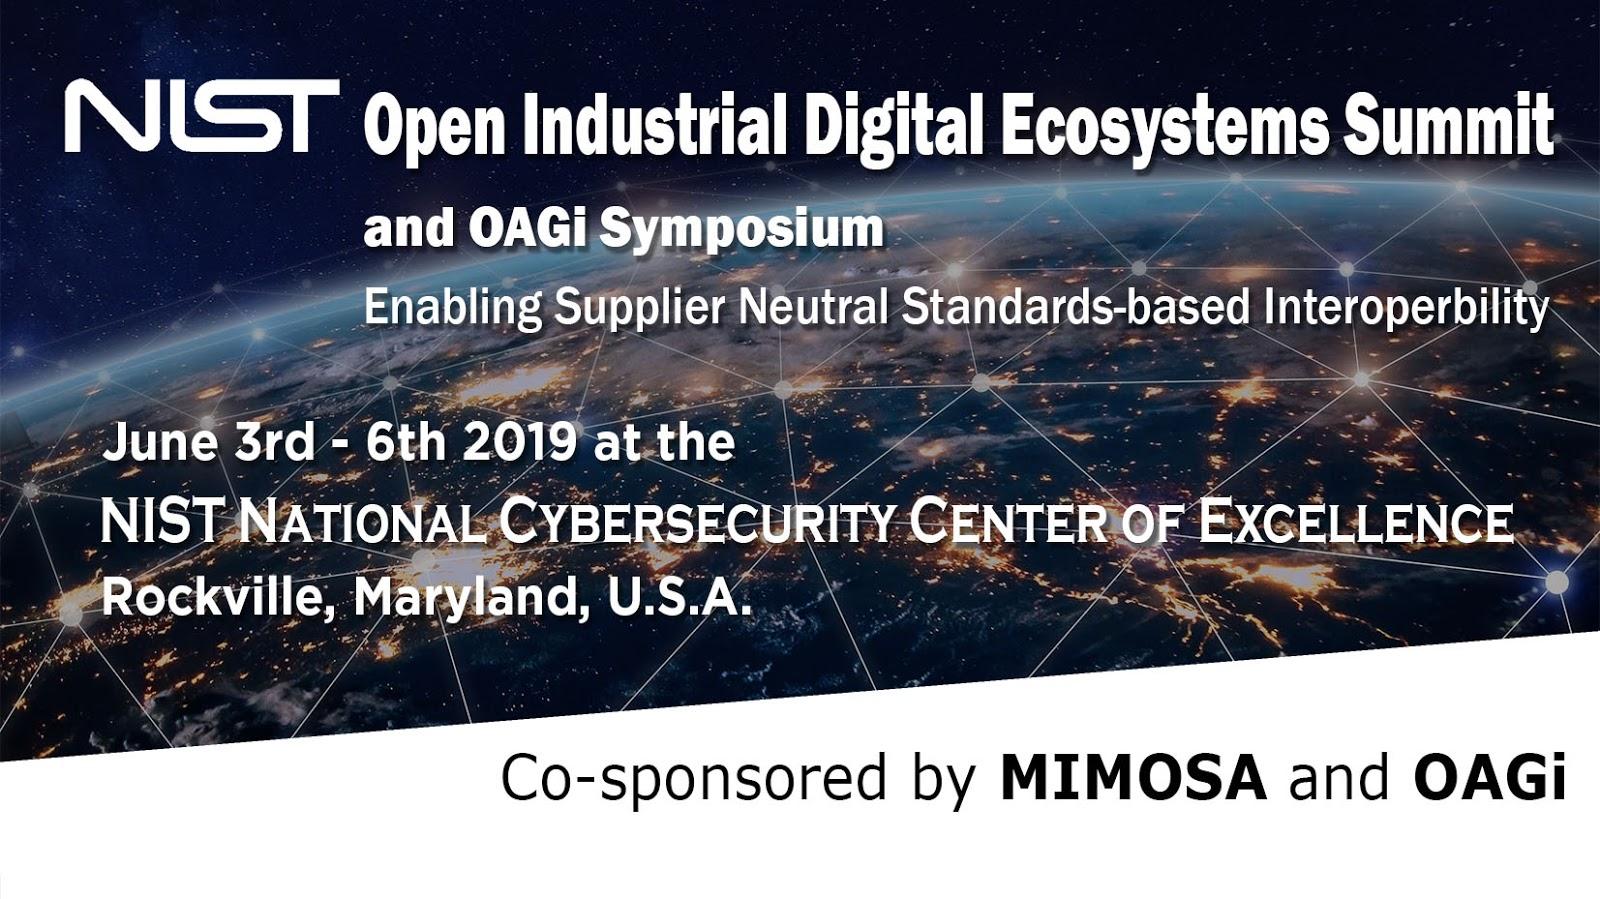 NIST Open Industrial Digital Ecosystem Summit and OAGi